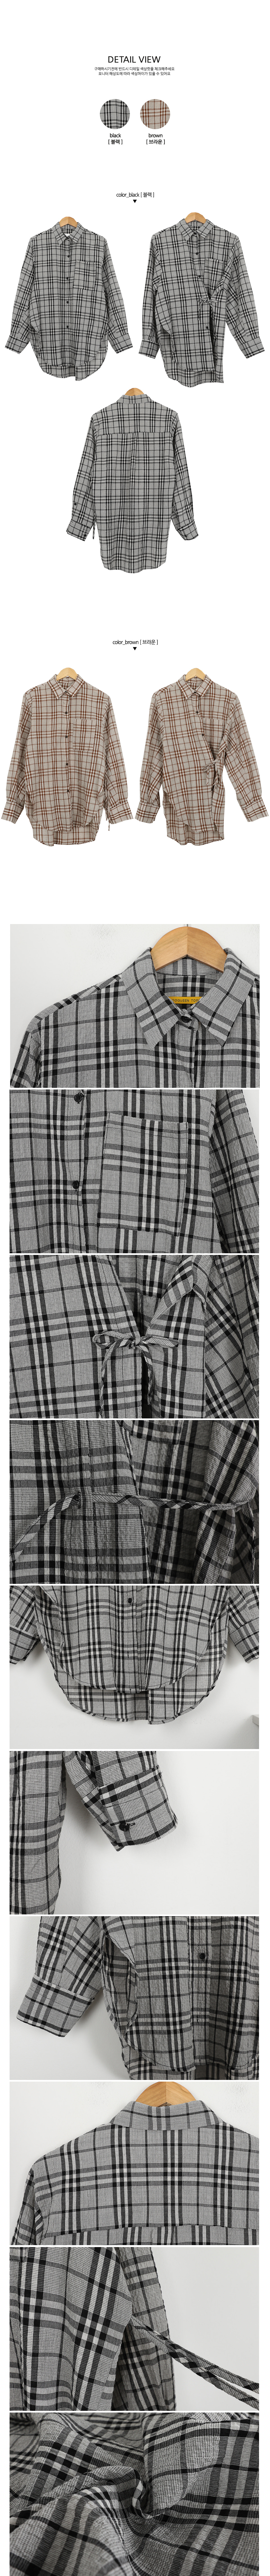 Doremi boxshirt check shirt